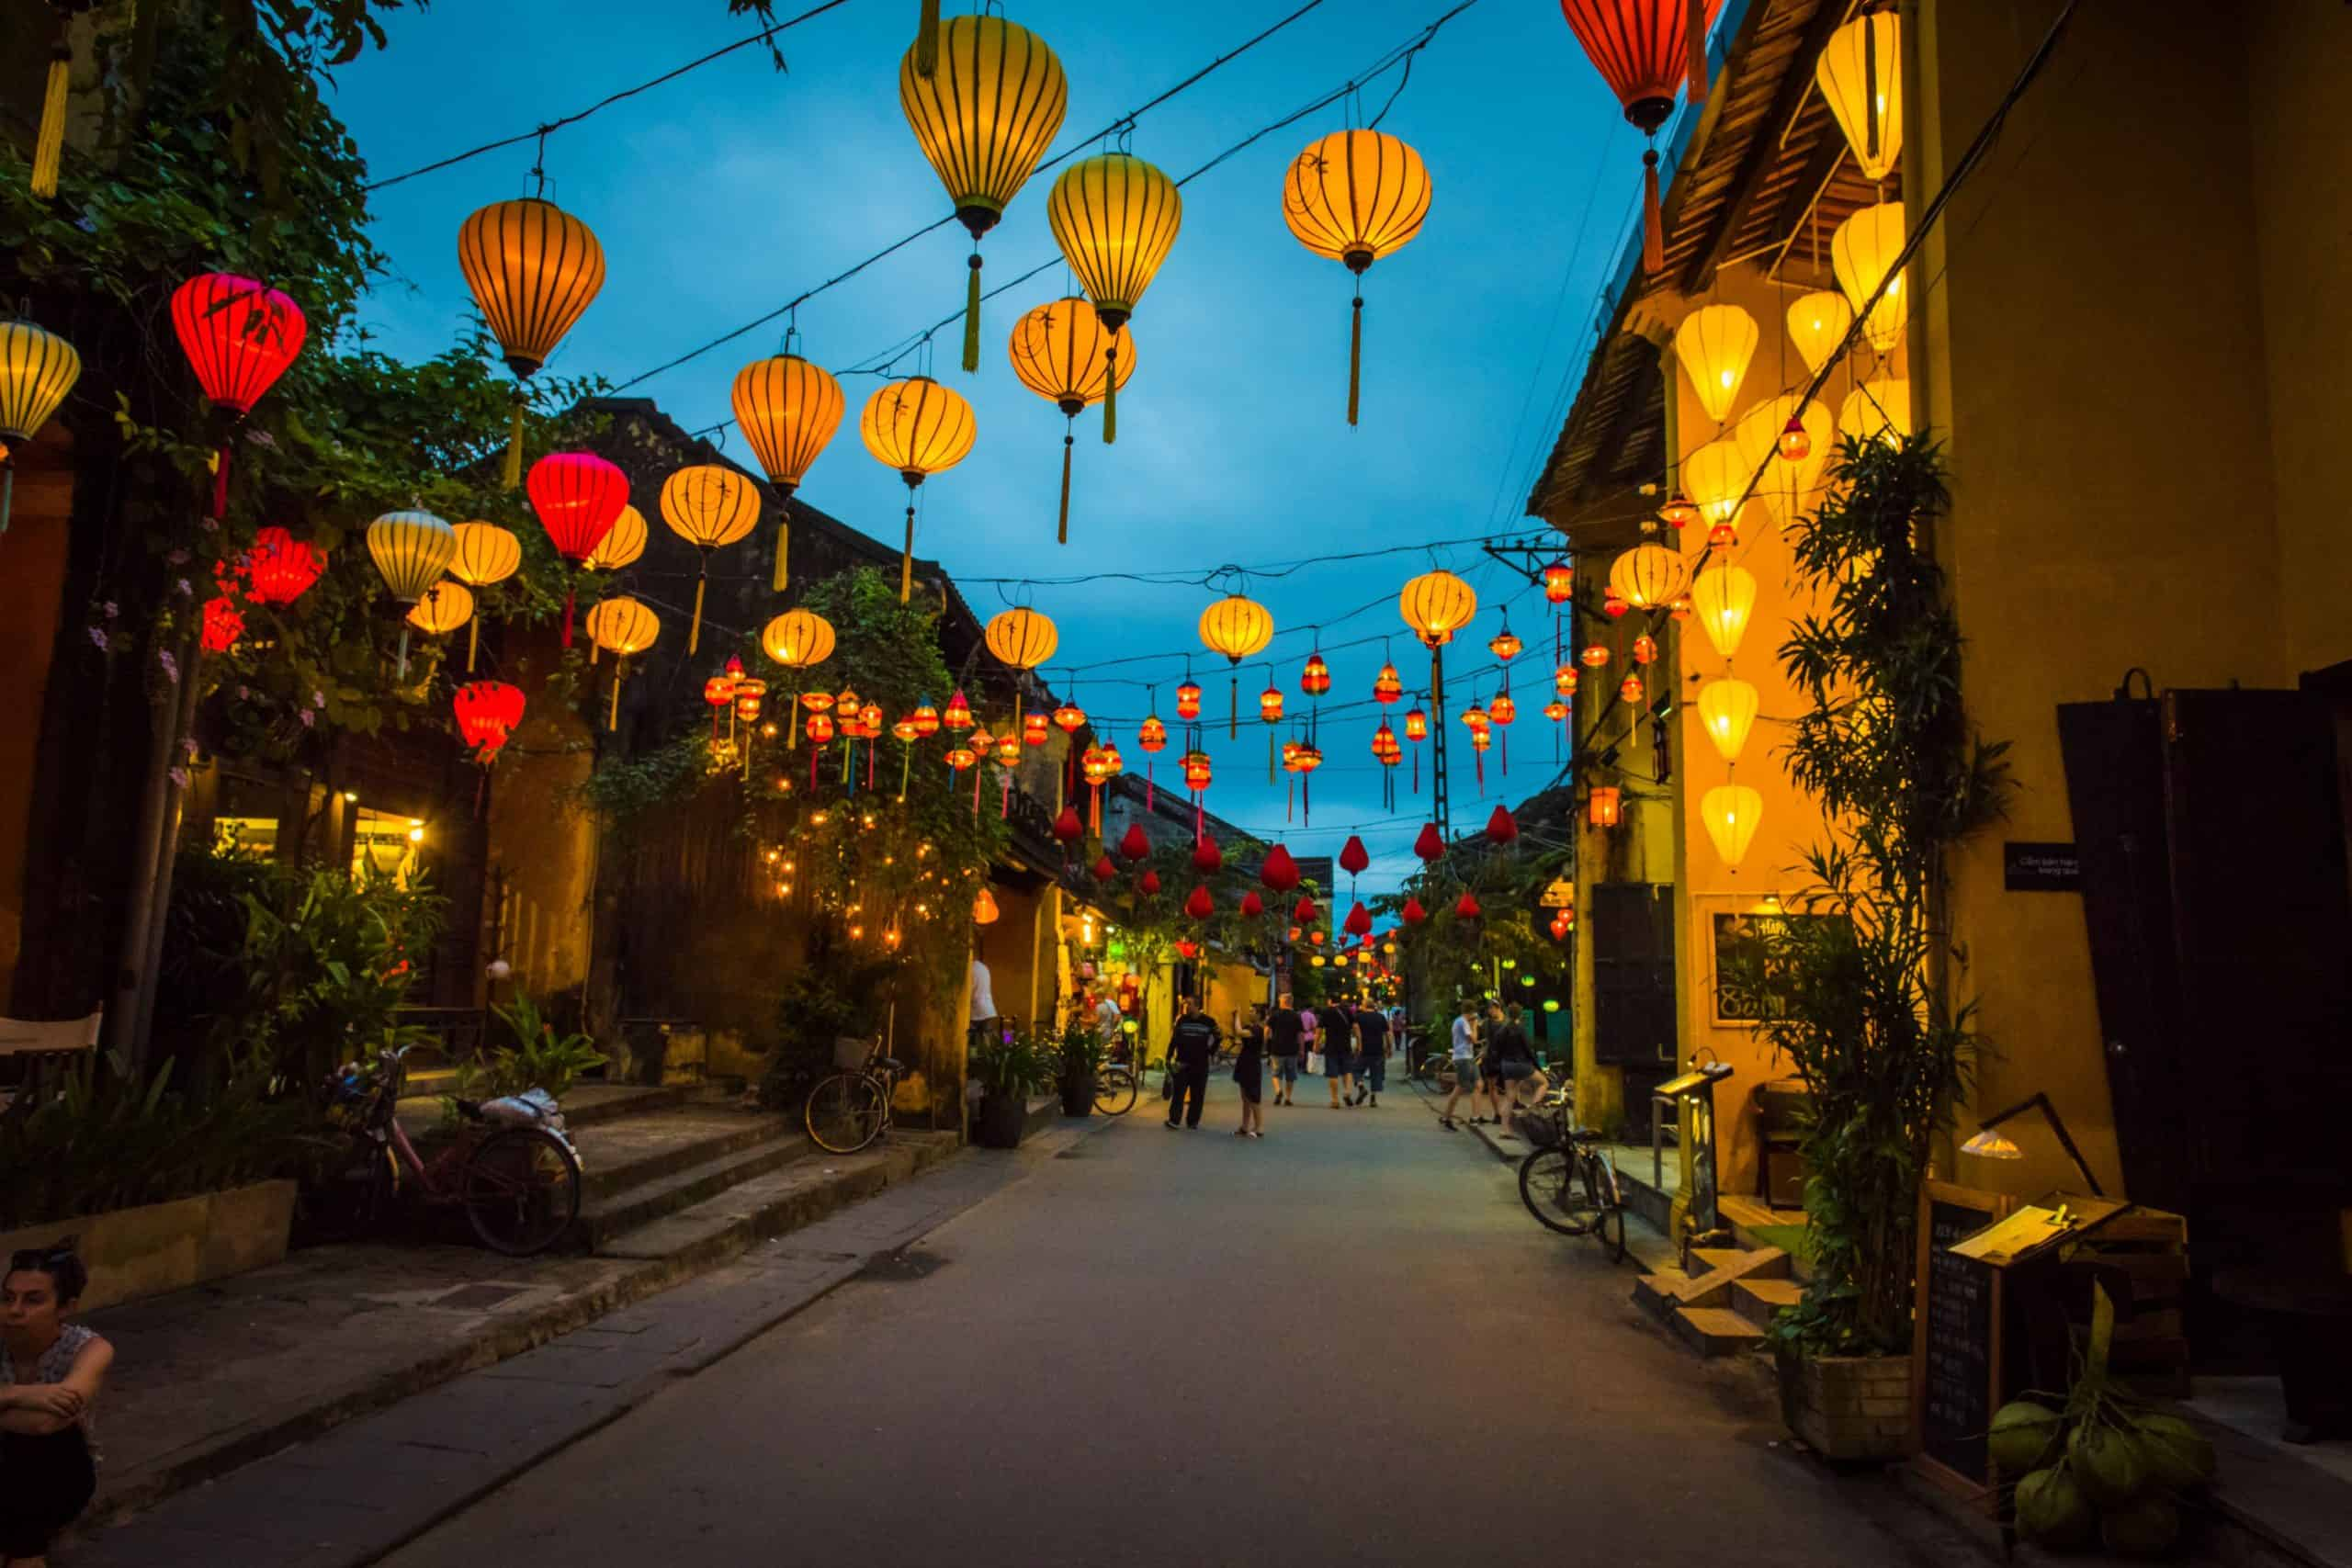 Highlights of Hoi An Lantern Festival